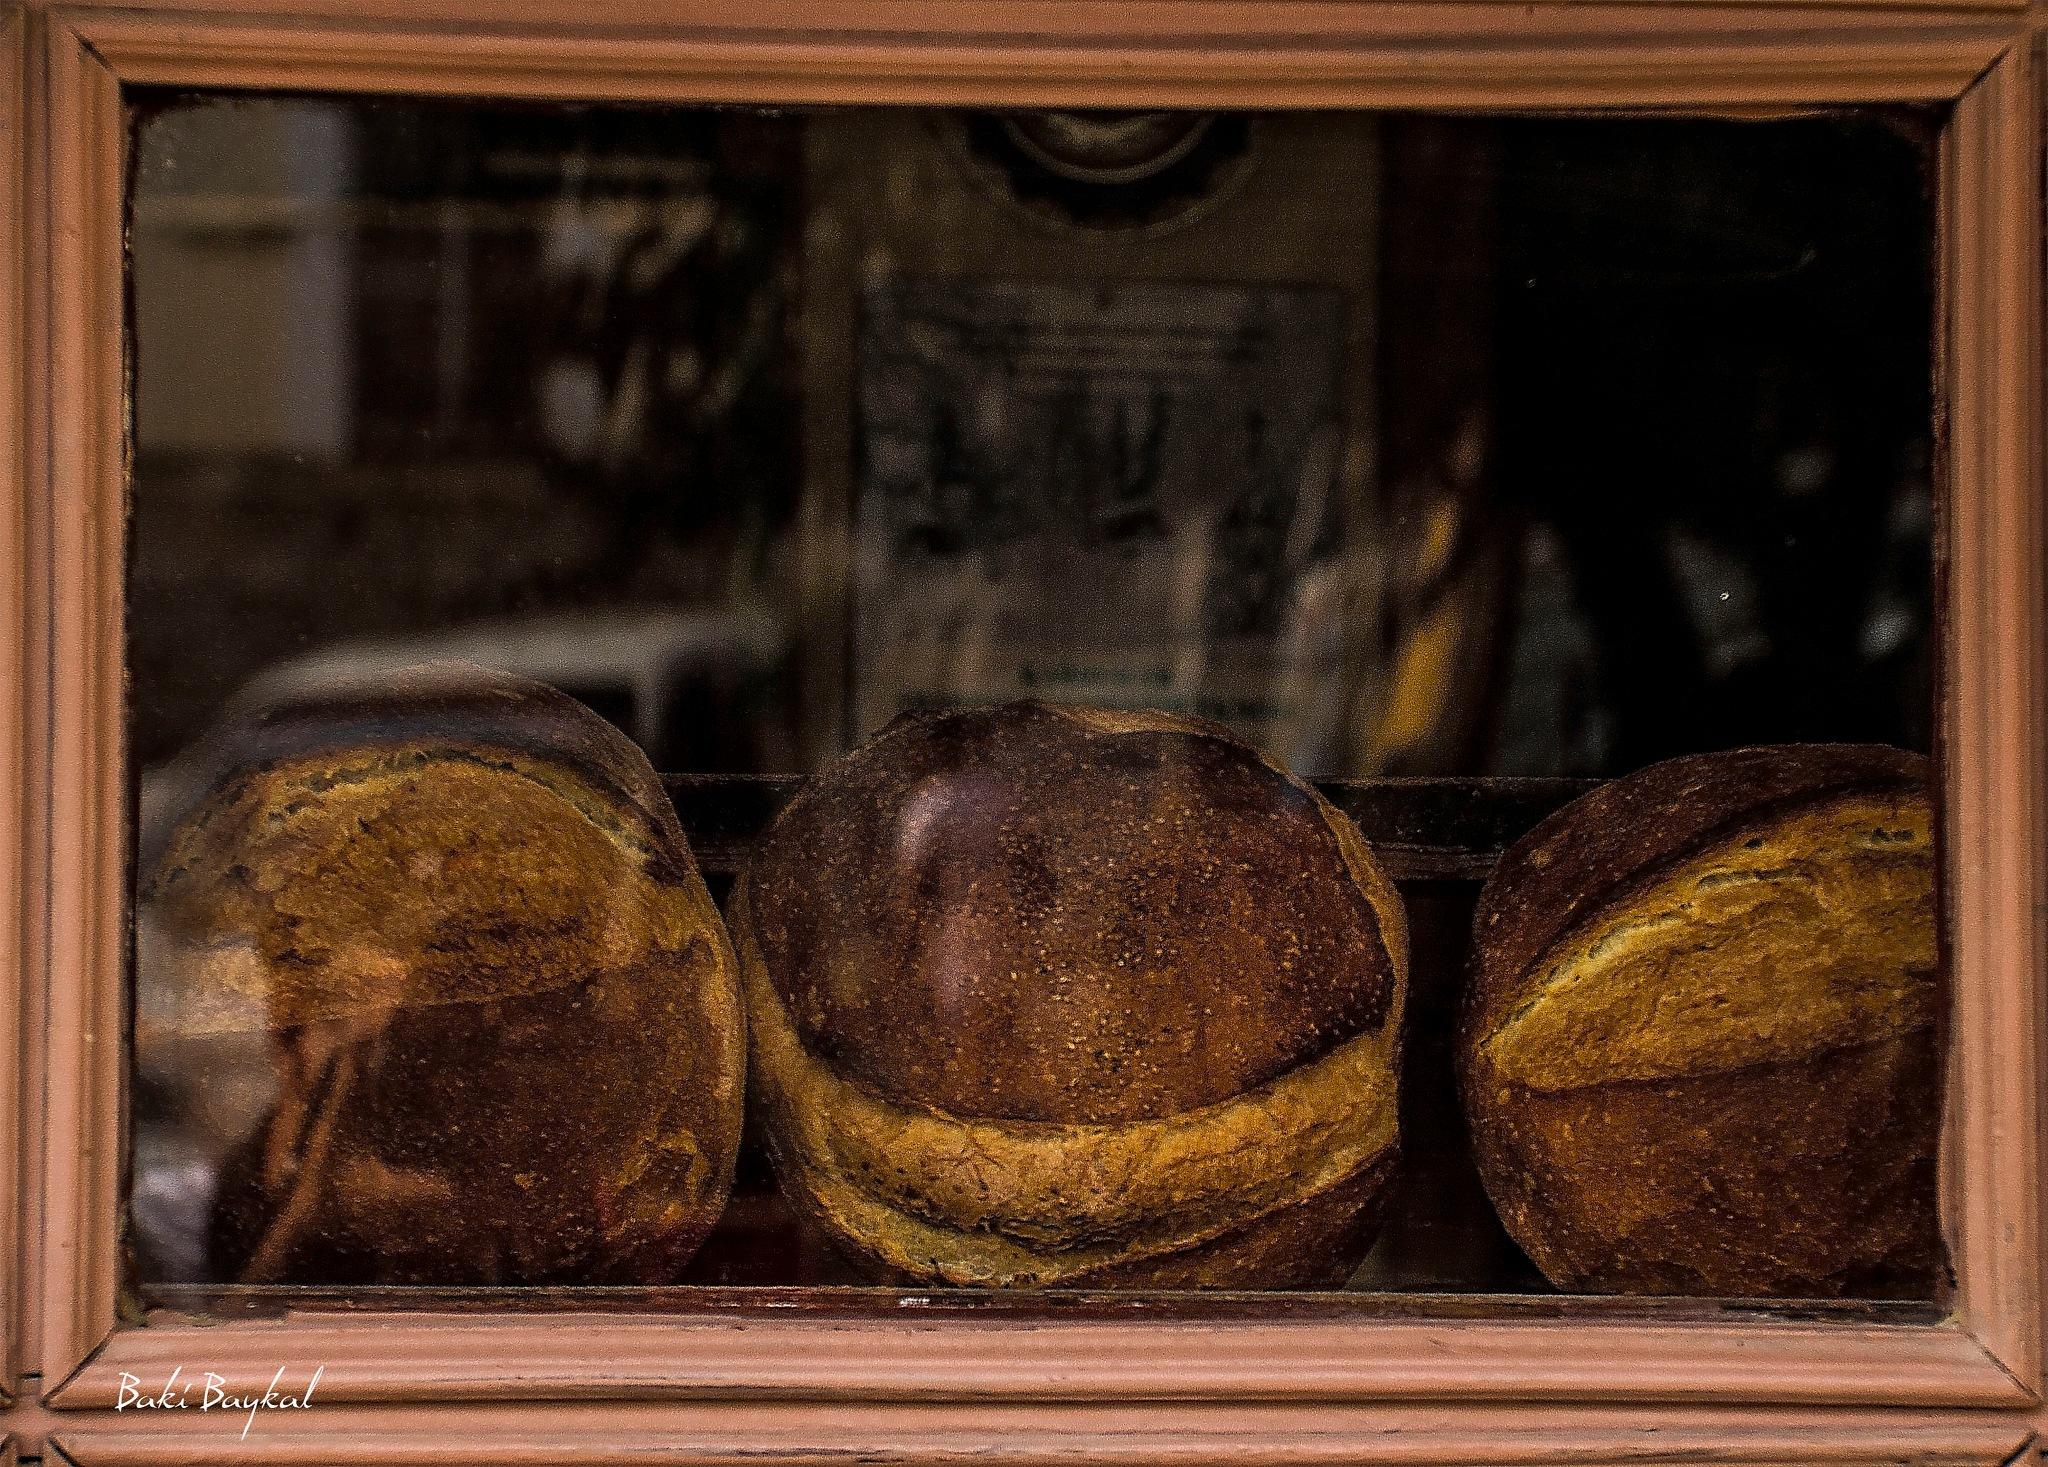 Bread by Baki Baykal